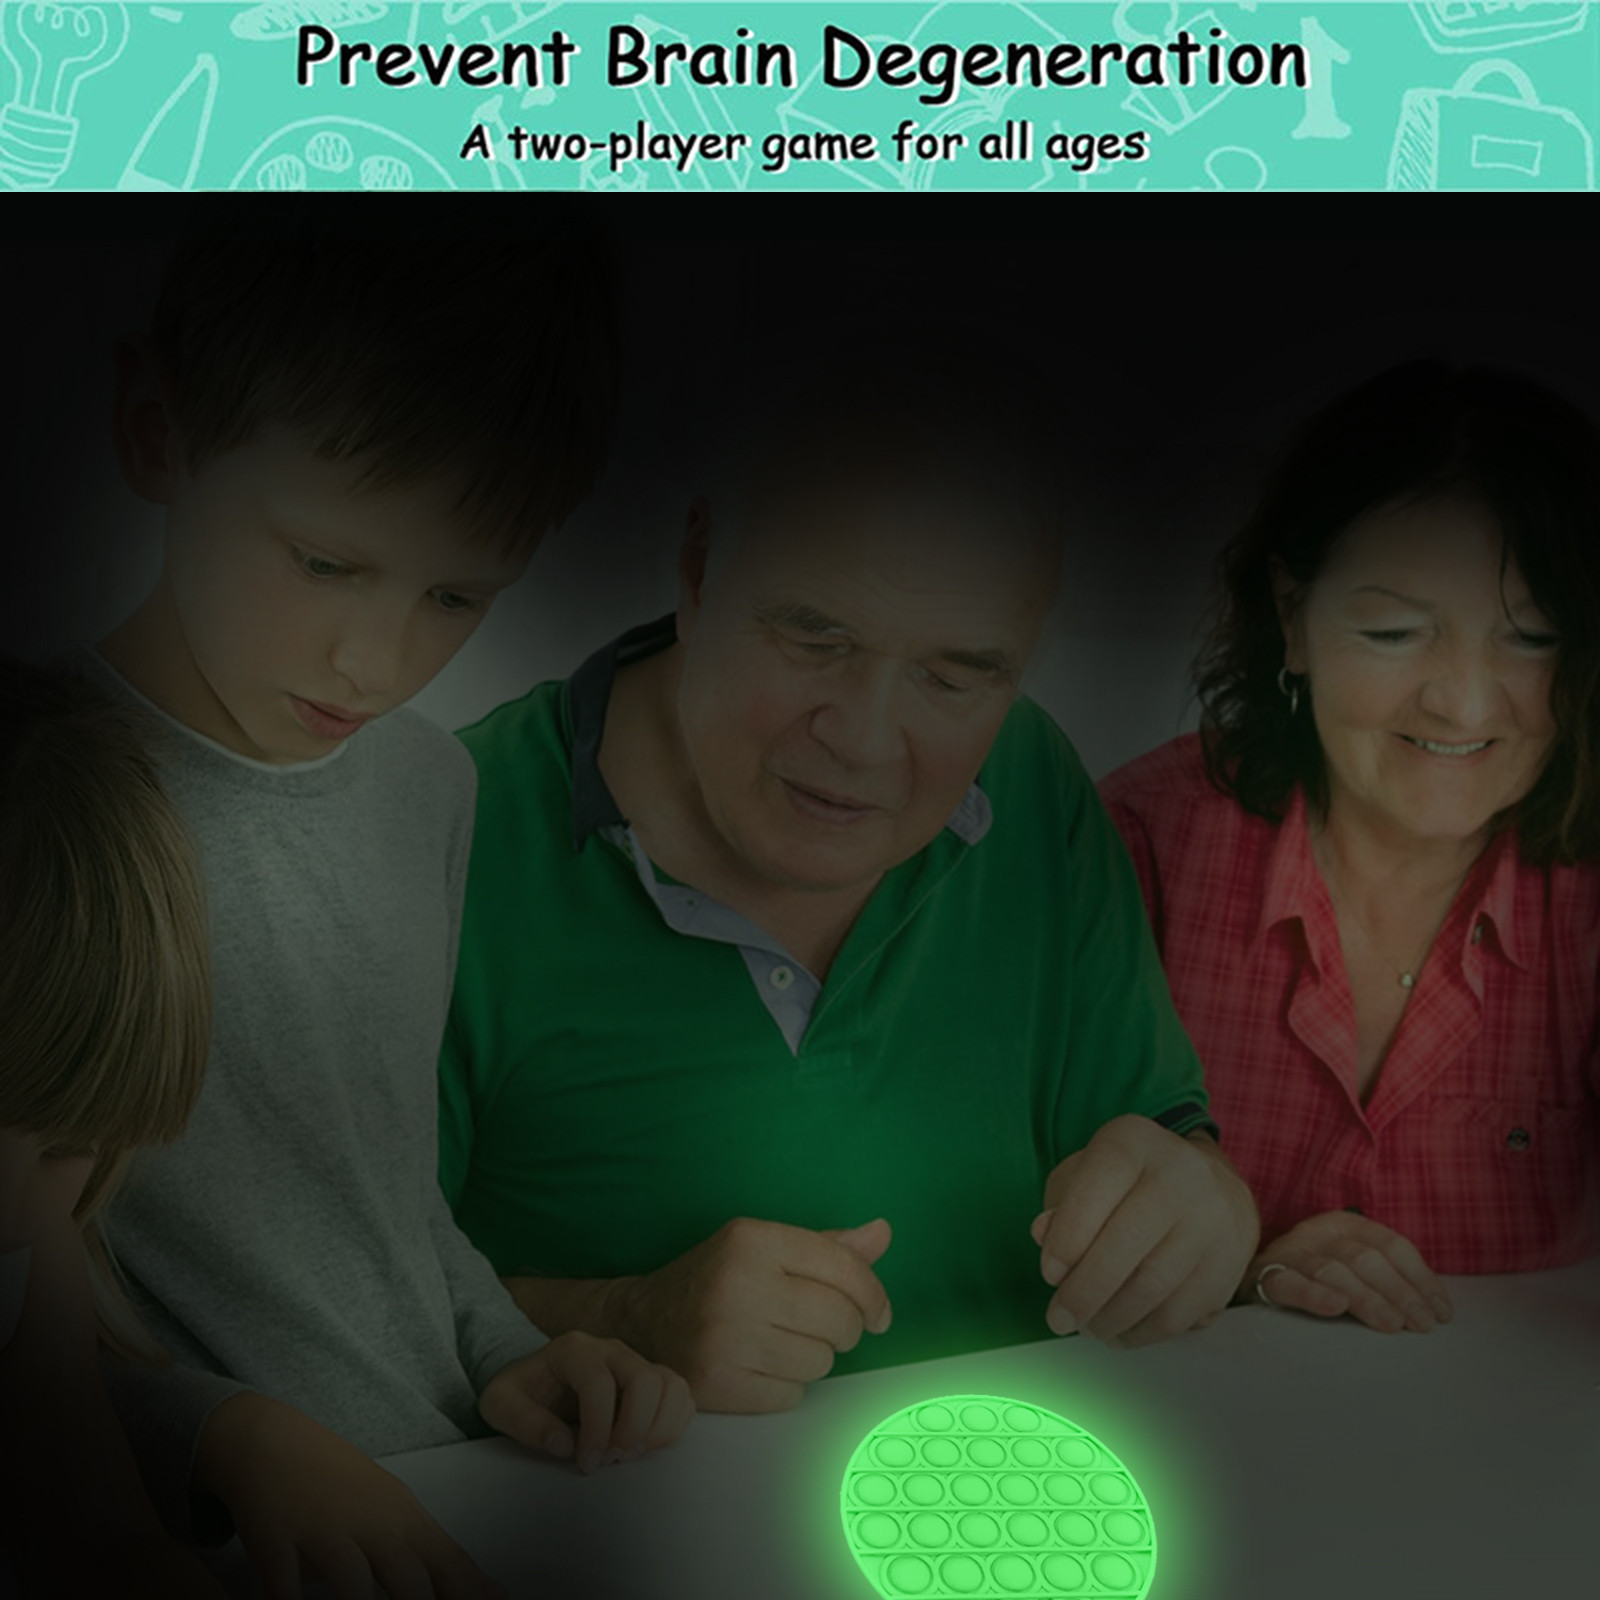 Toy Bubble-Fidget Fidget-Sensory Toy-Stress Relief Adult Glow-In-The-Dark Push Kids img4